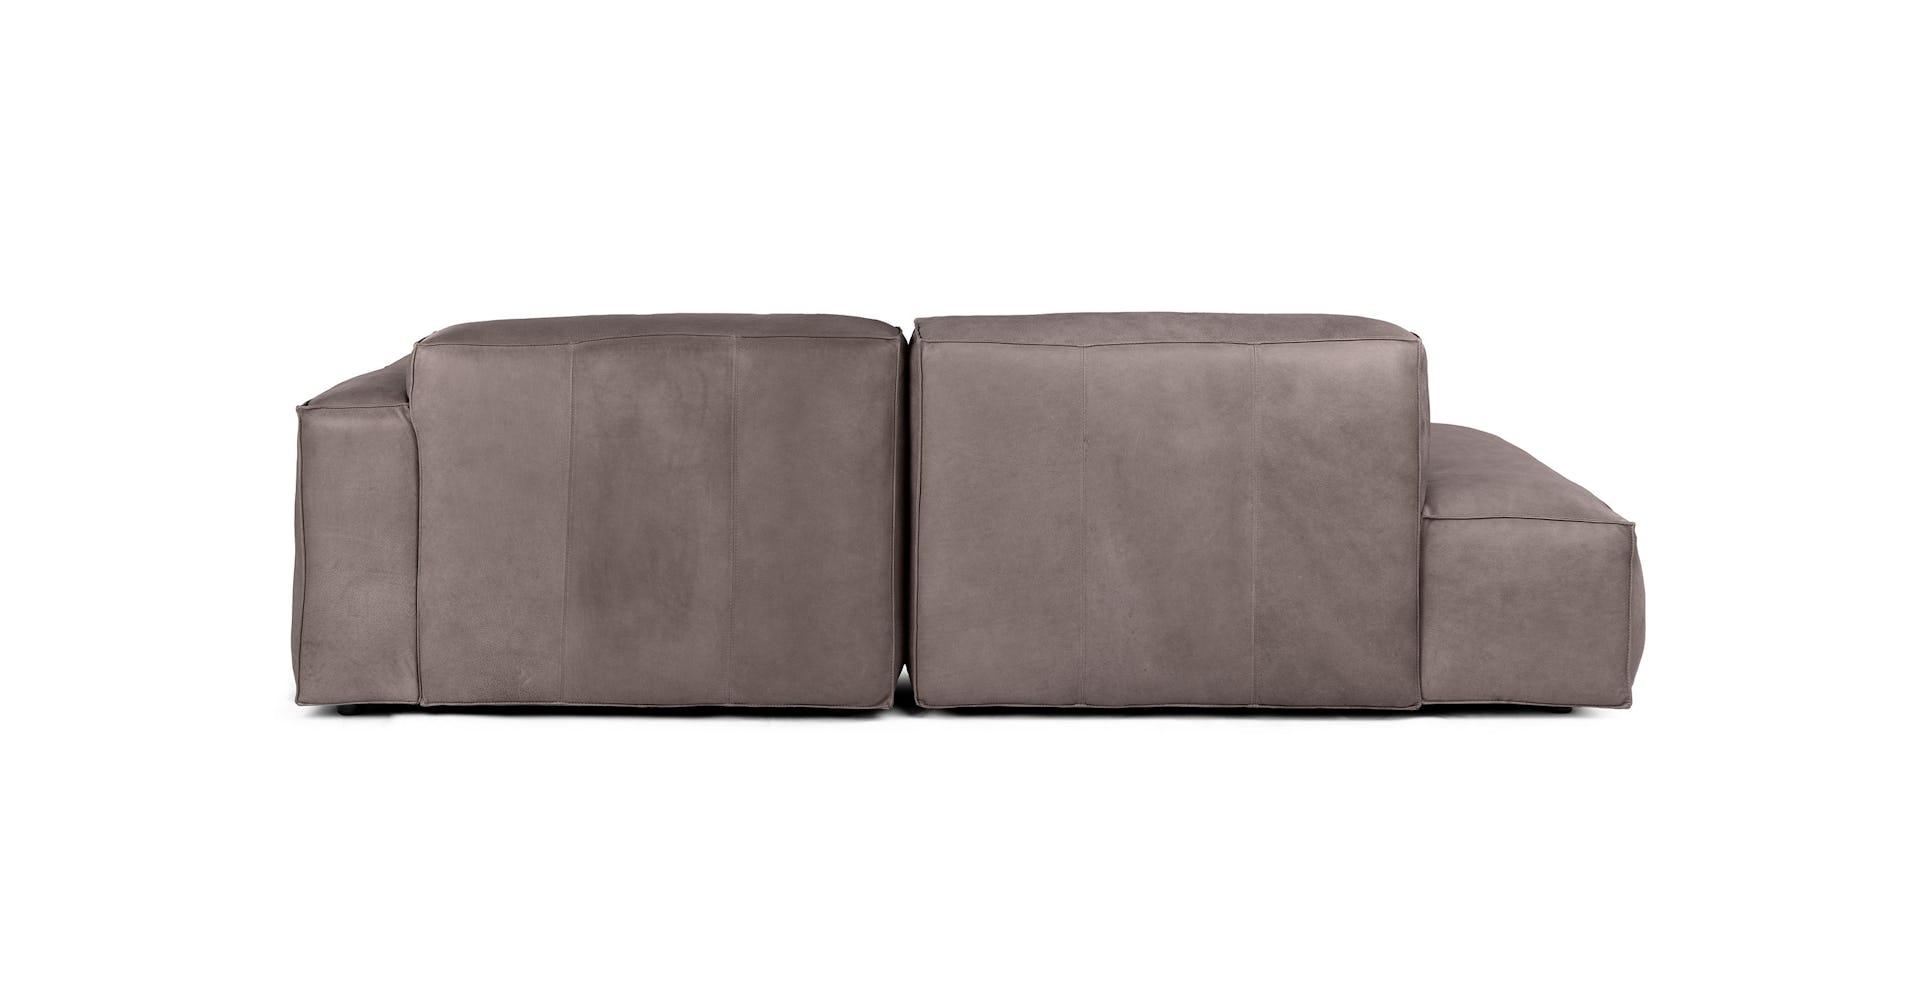 Solae Canyon Charcoal Right Arm Modular Sofa